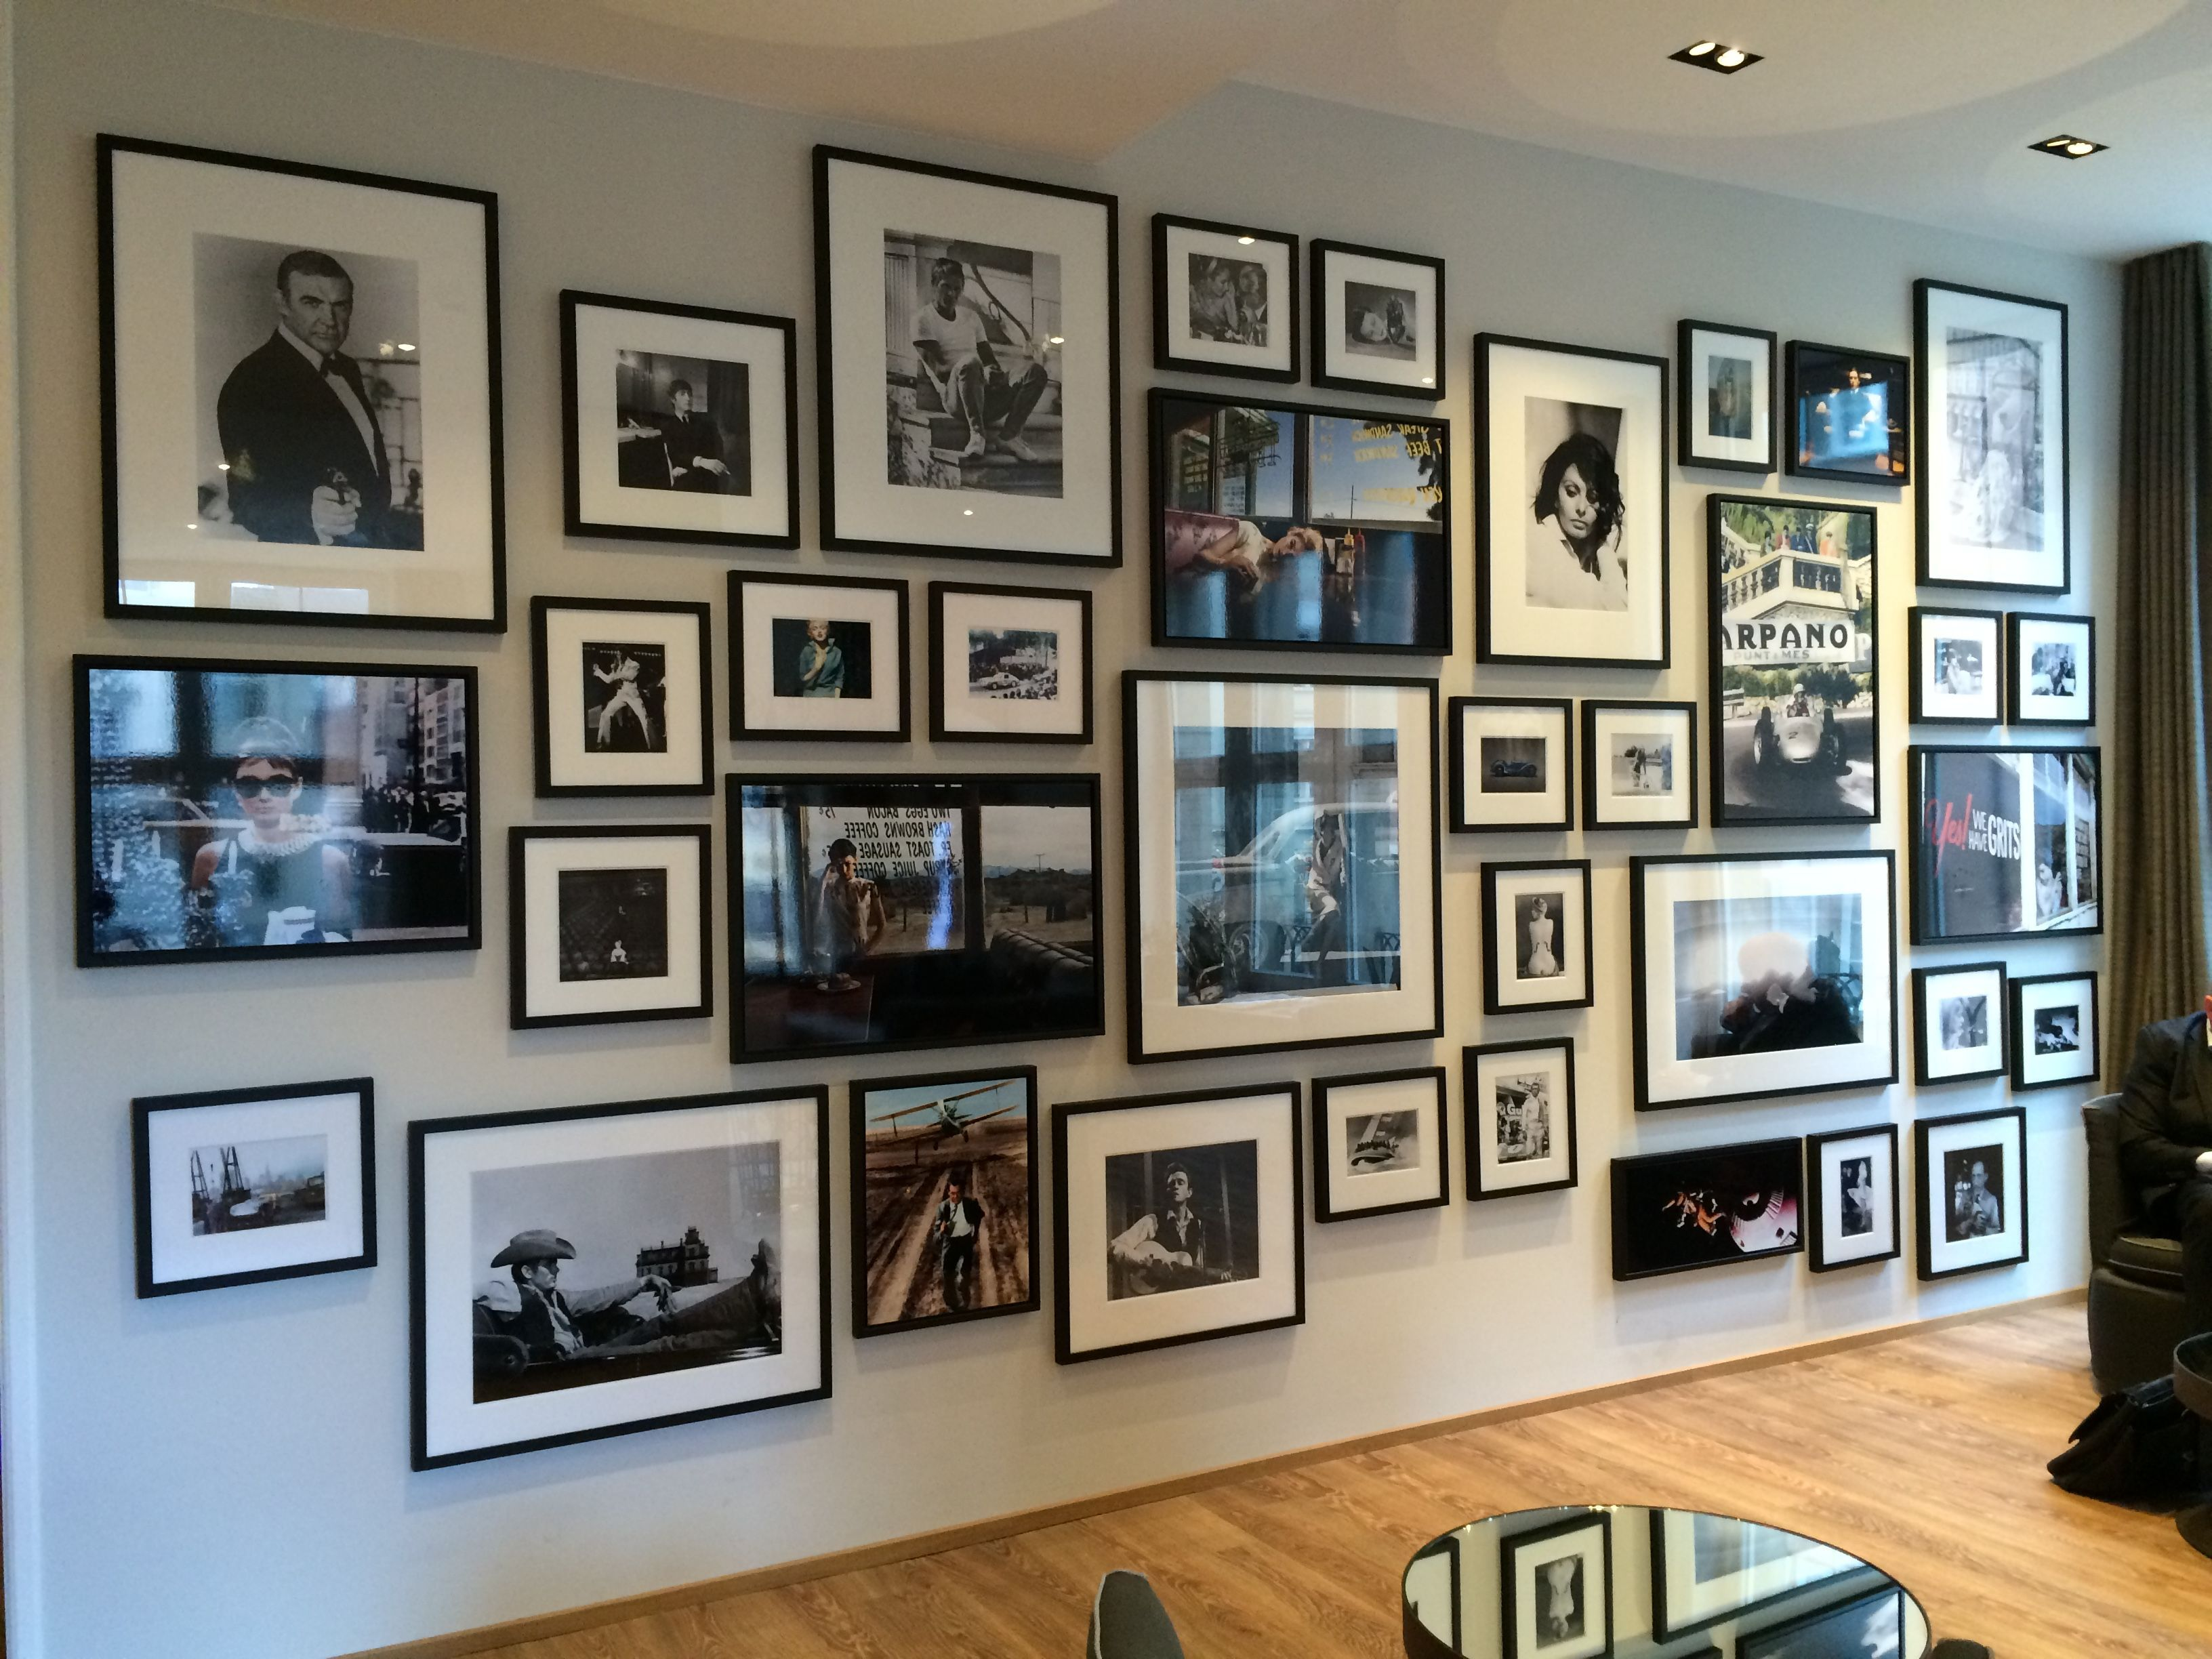 17 Hallwaybookshelves In 2020 Frames On Wall Photo Wall Gallery Wall